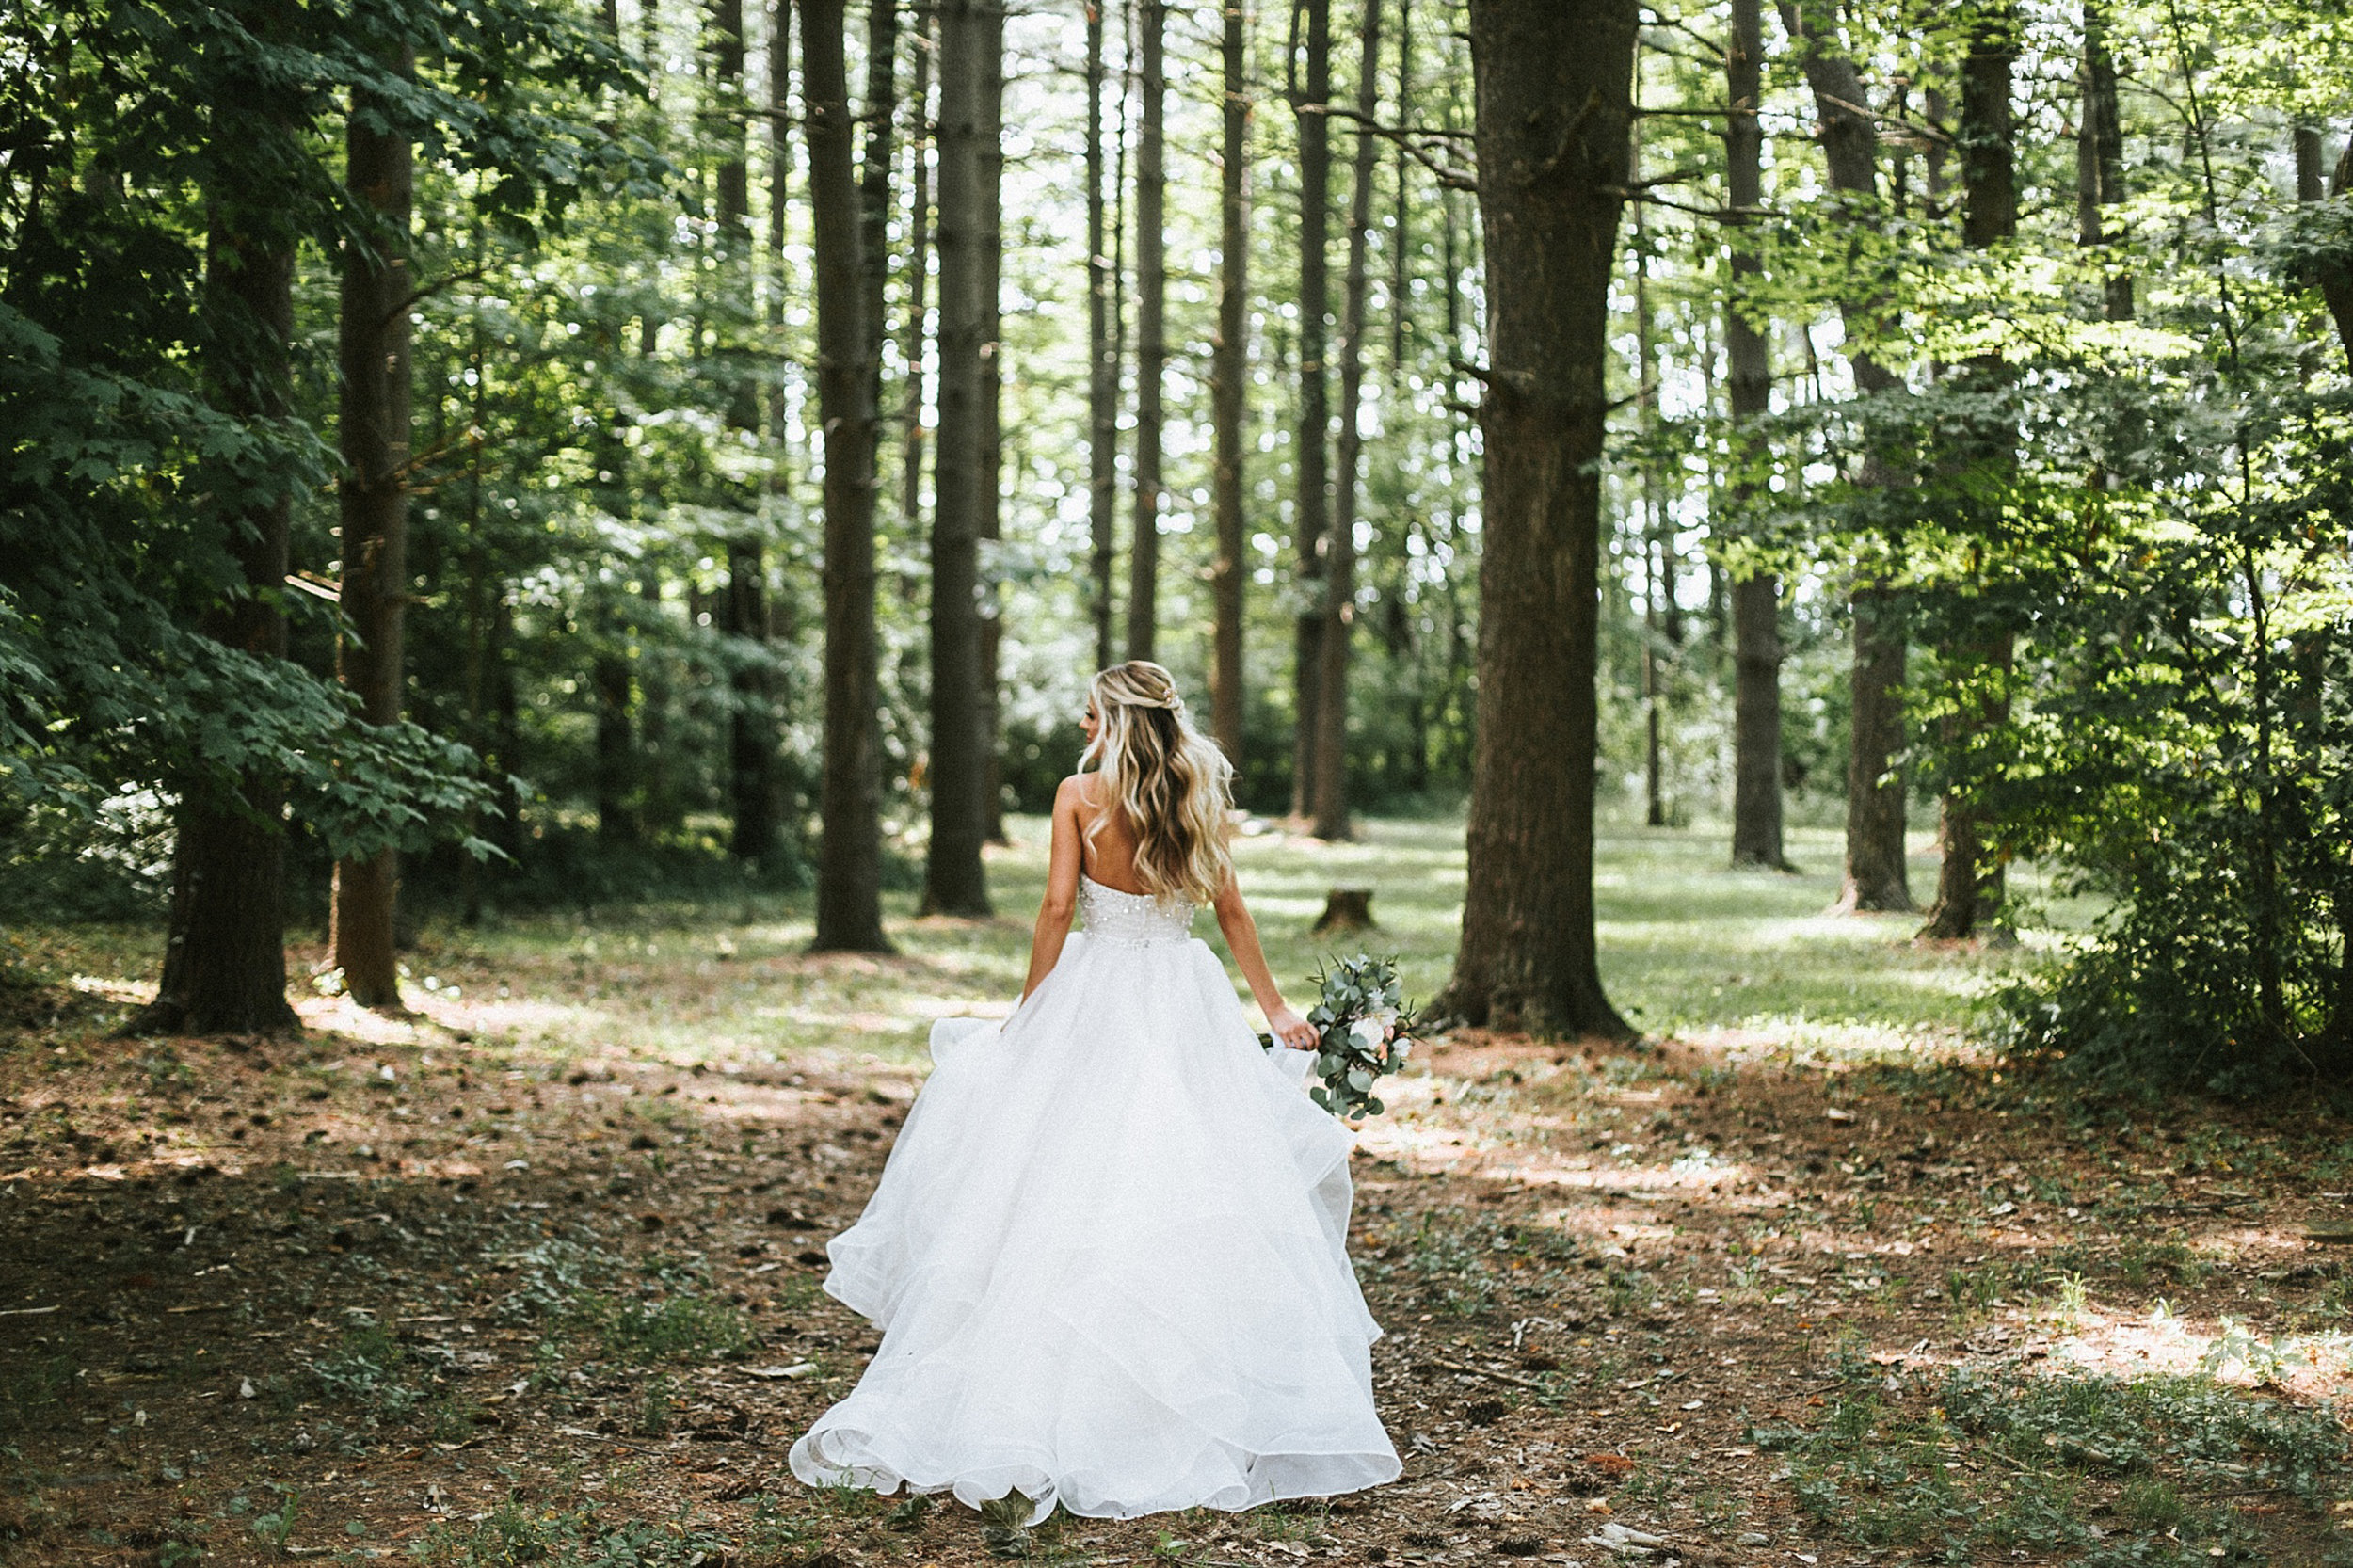 Brooke Townsend Photography - Cincinnati Wedding Photographer (27 of 153).jpg